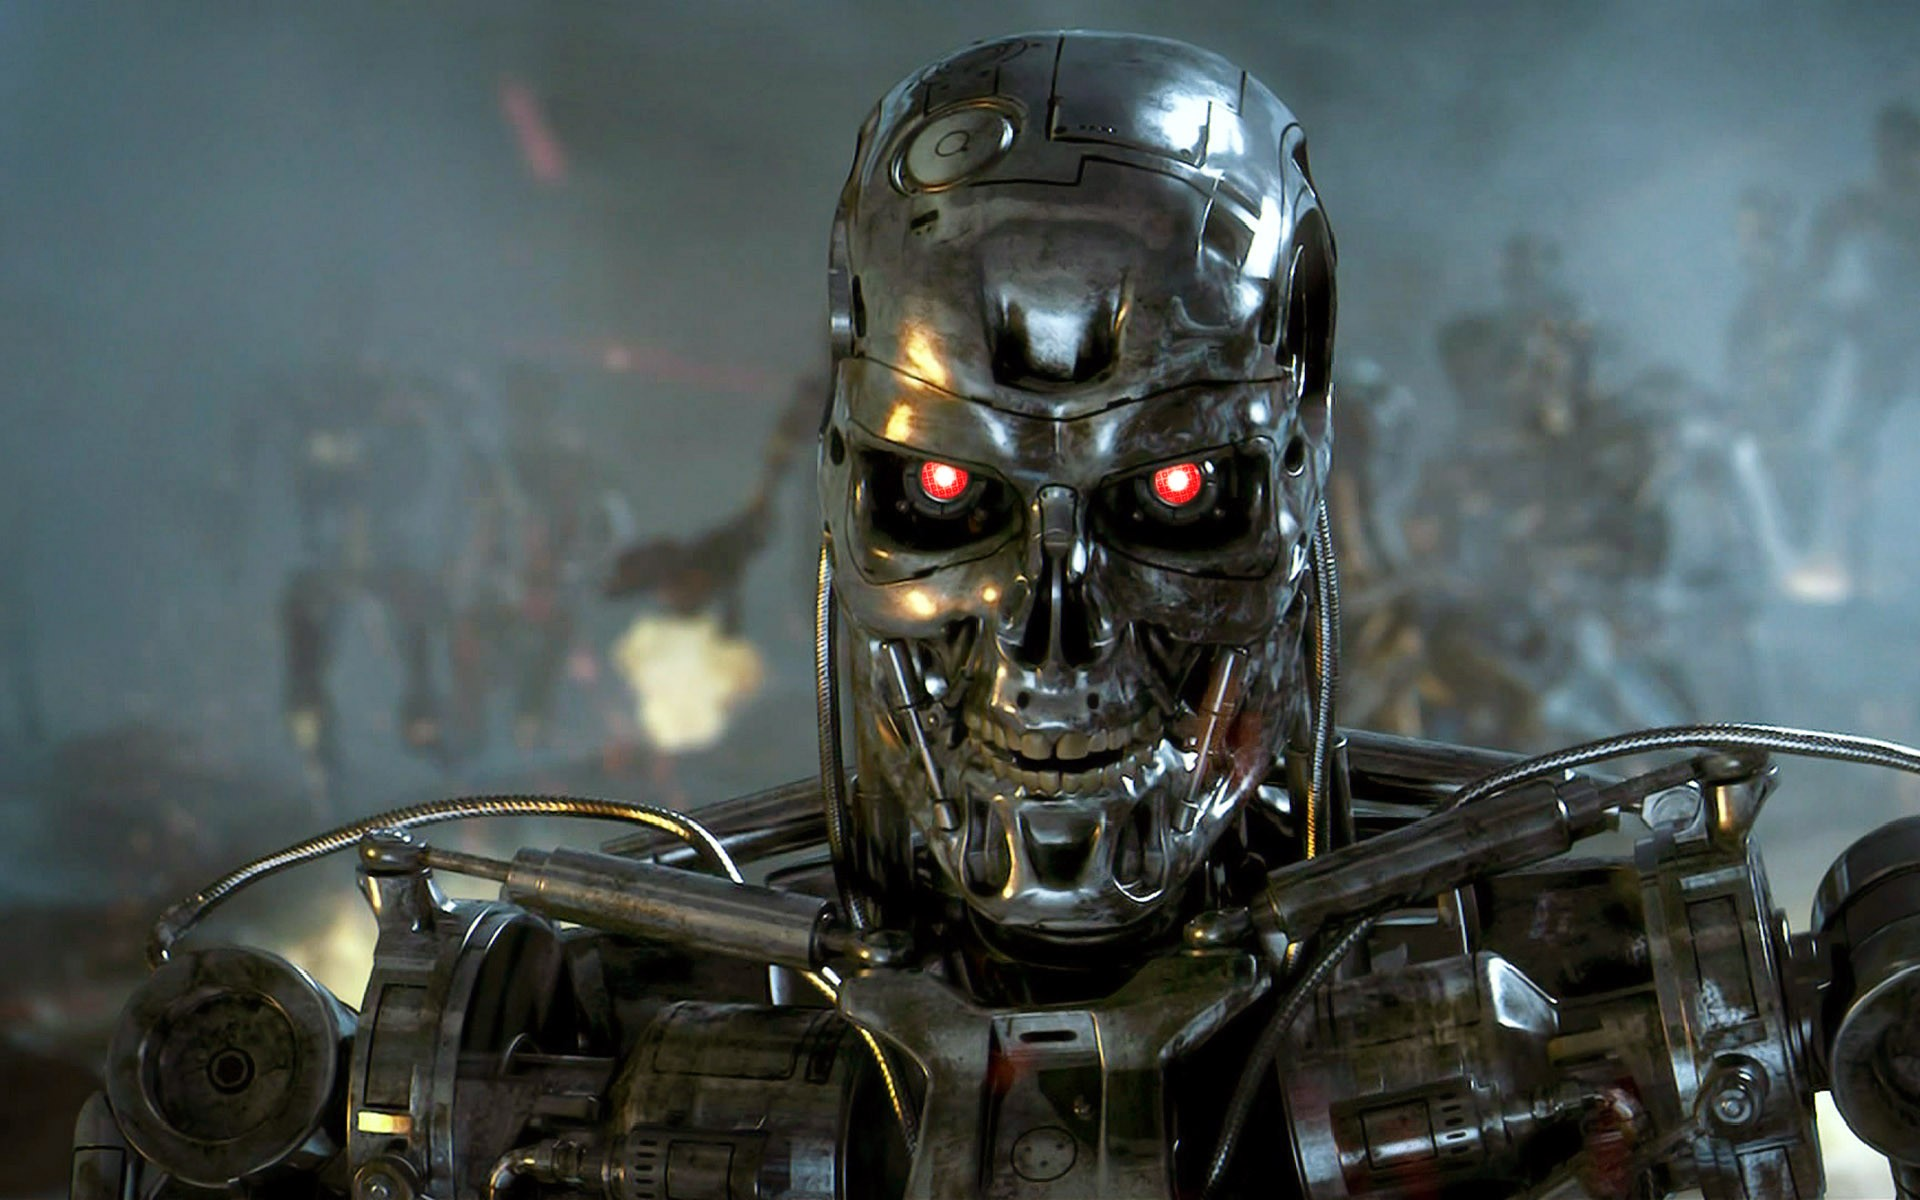 DARPA Optogenetics Implant Terminator Vision 3